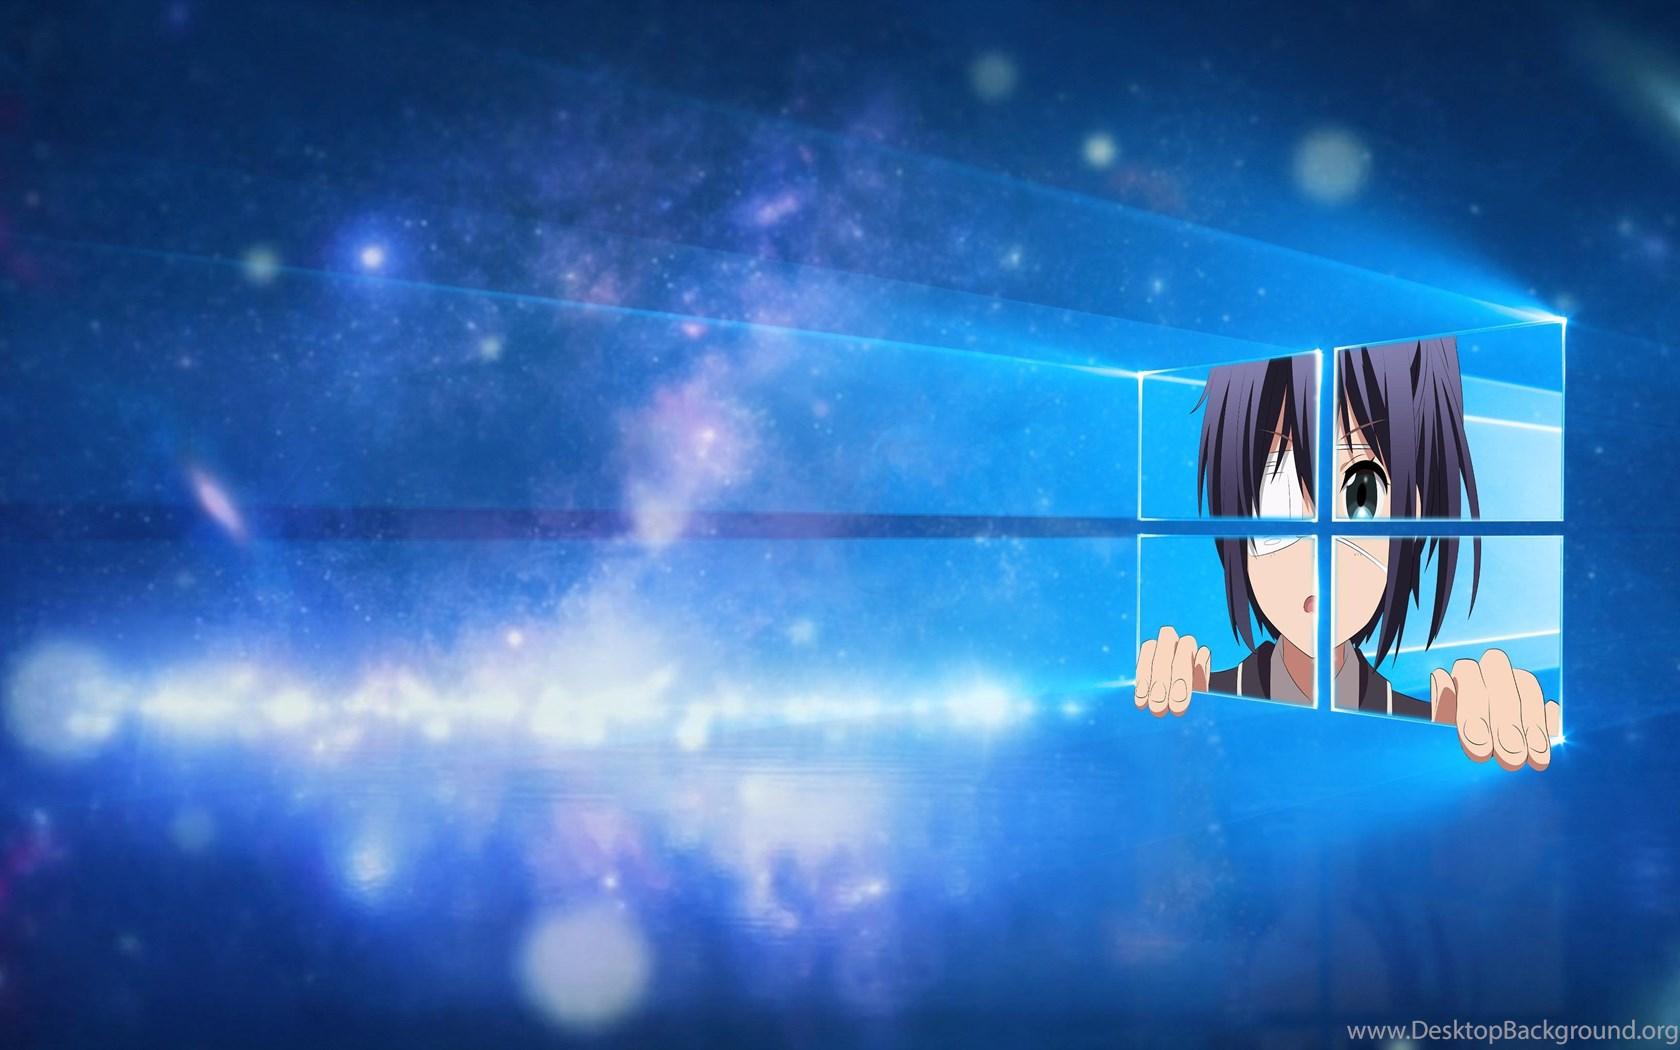 4K Windows 10 Anime Manga Wallpapers Desktop Background